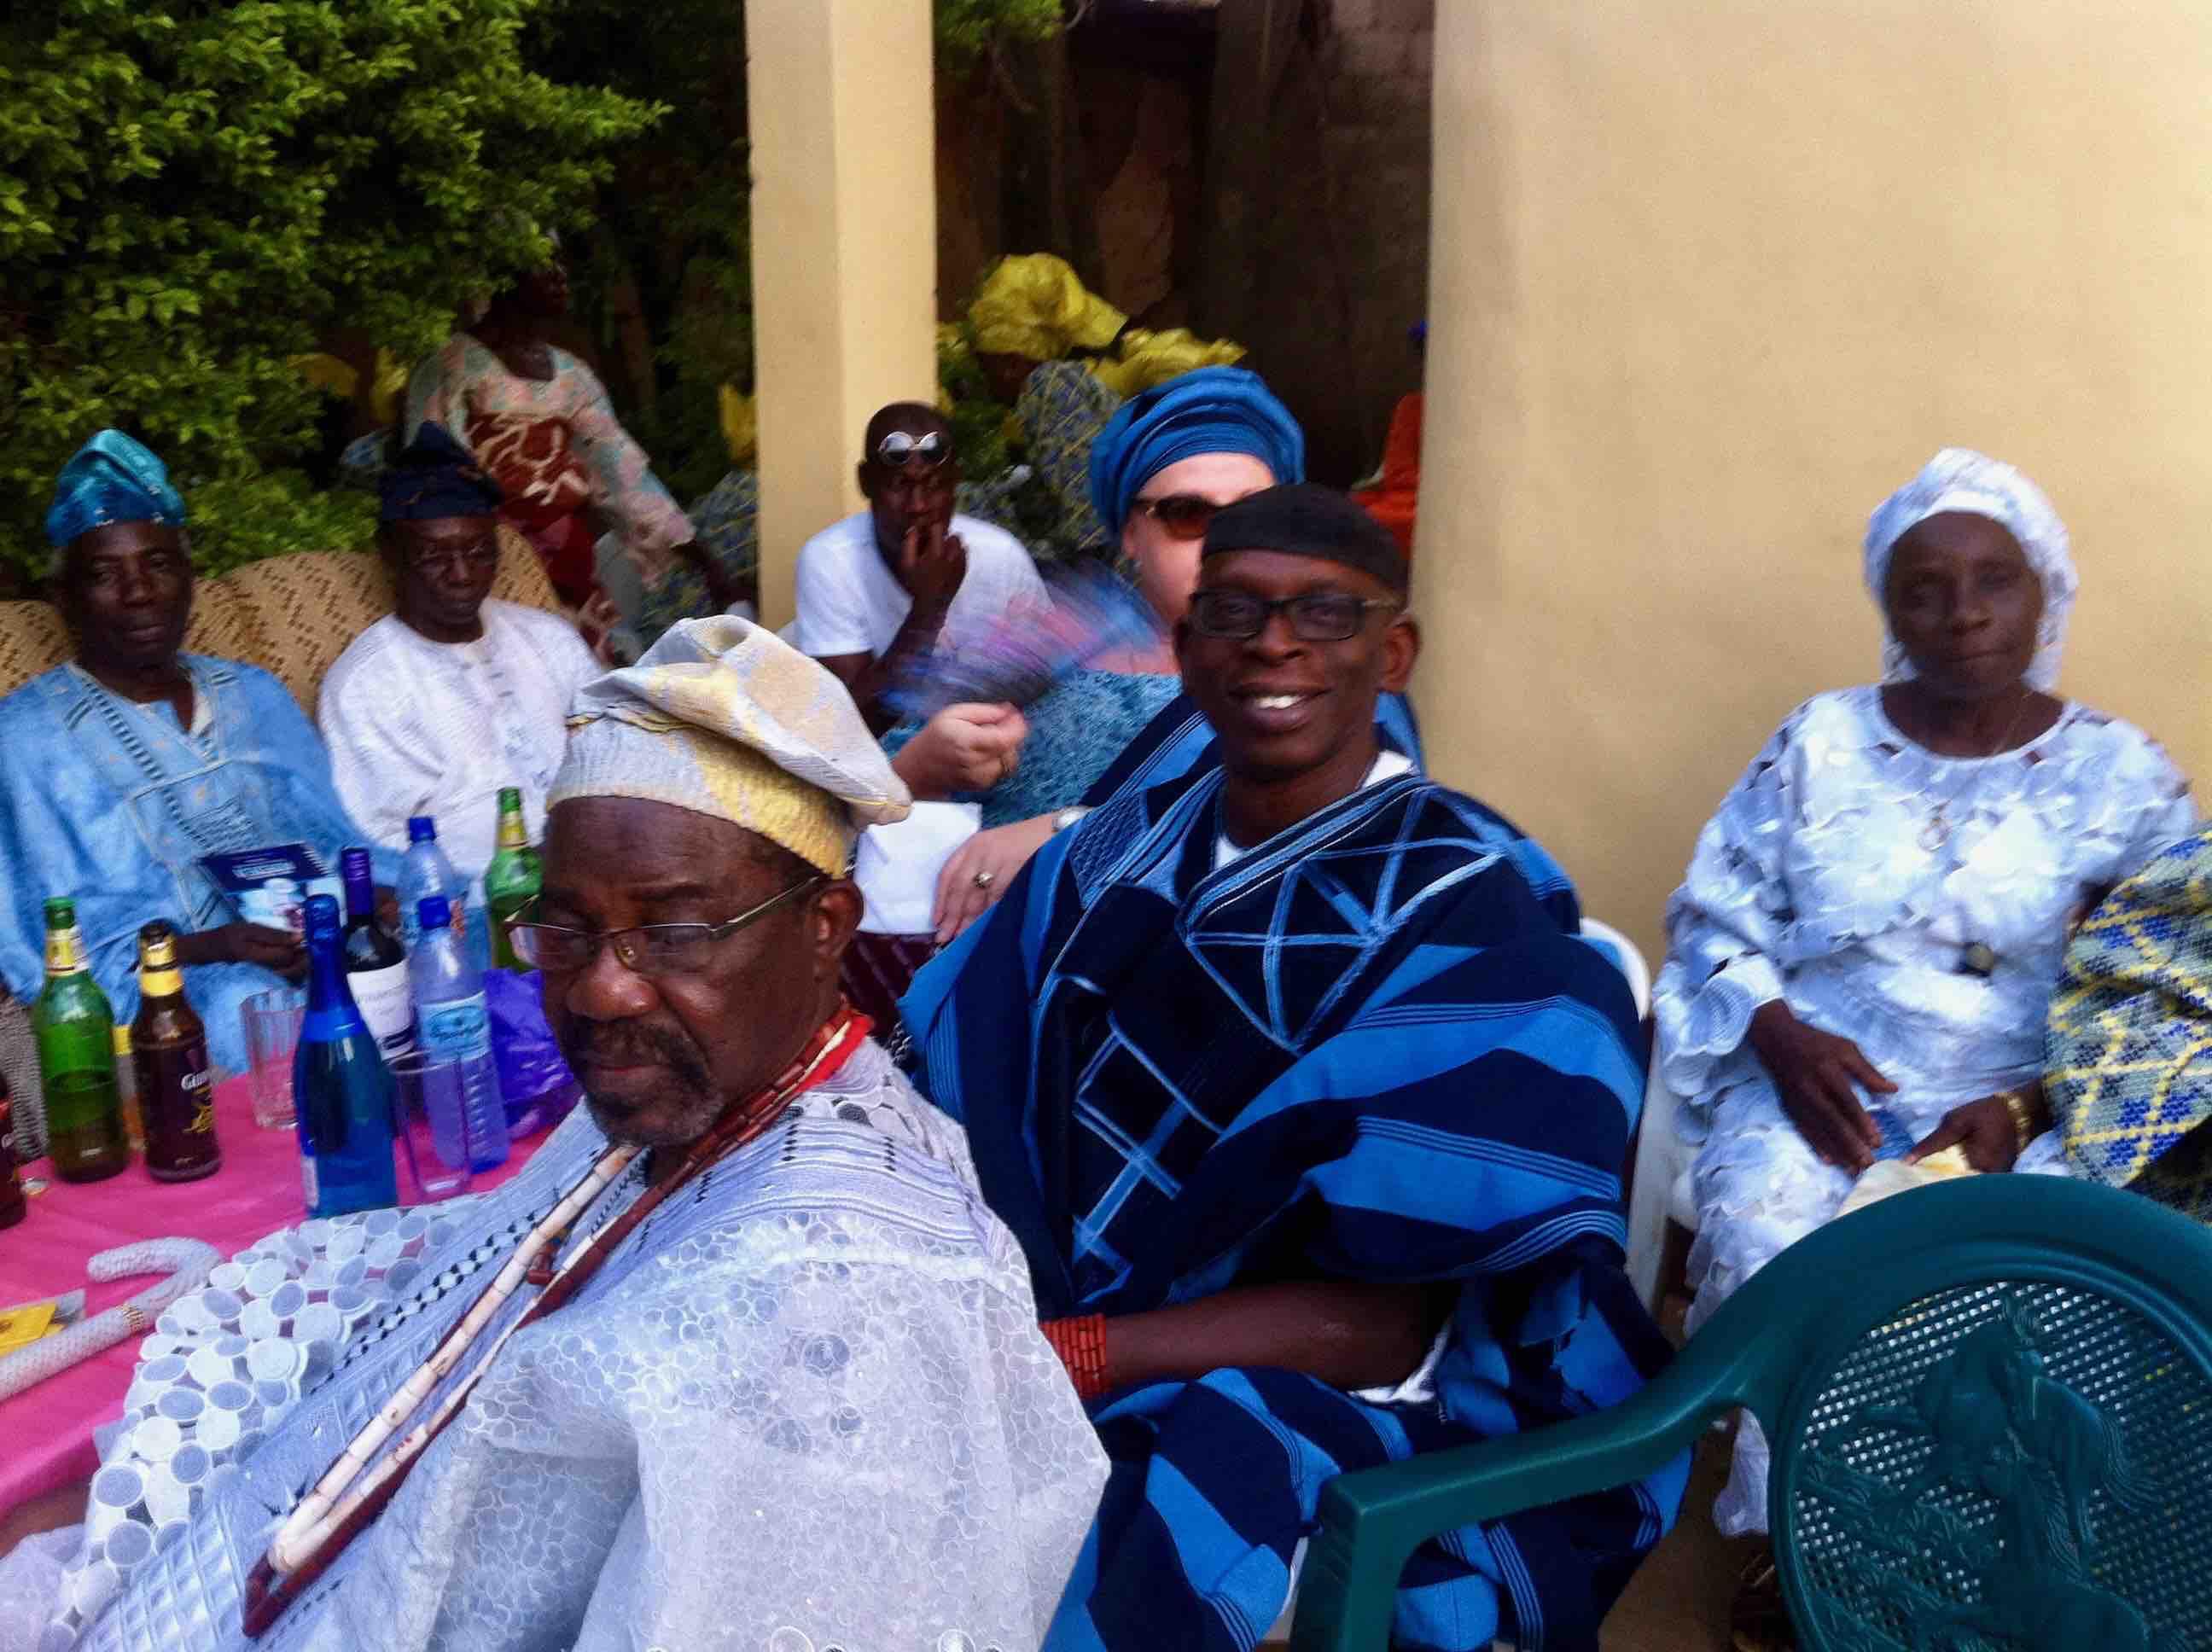 Risawe of Ijesha land, Chief Adefioye Adedeji & Prince Adeleke Oyinlola, Ilesa, Osun, Nigeria. #JujuFilms